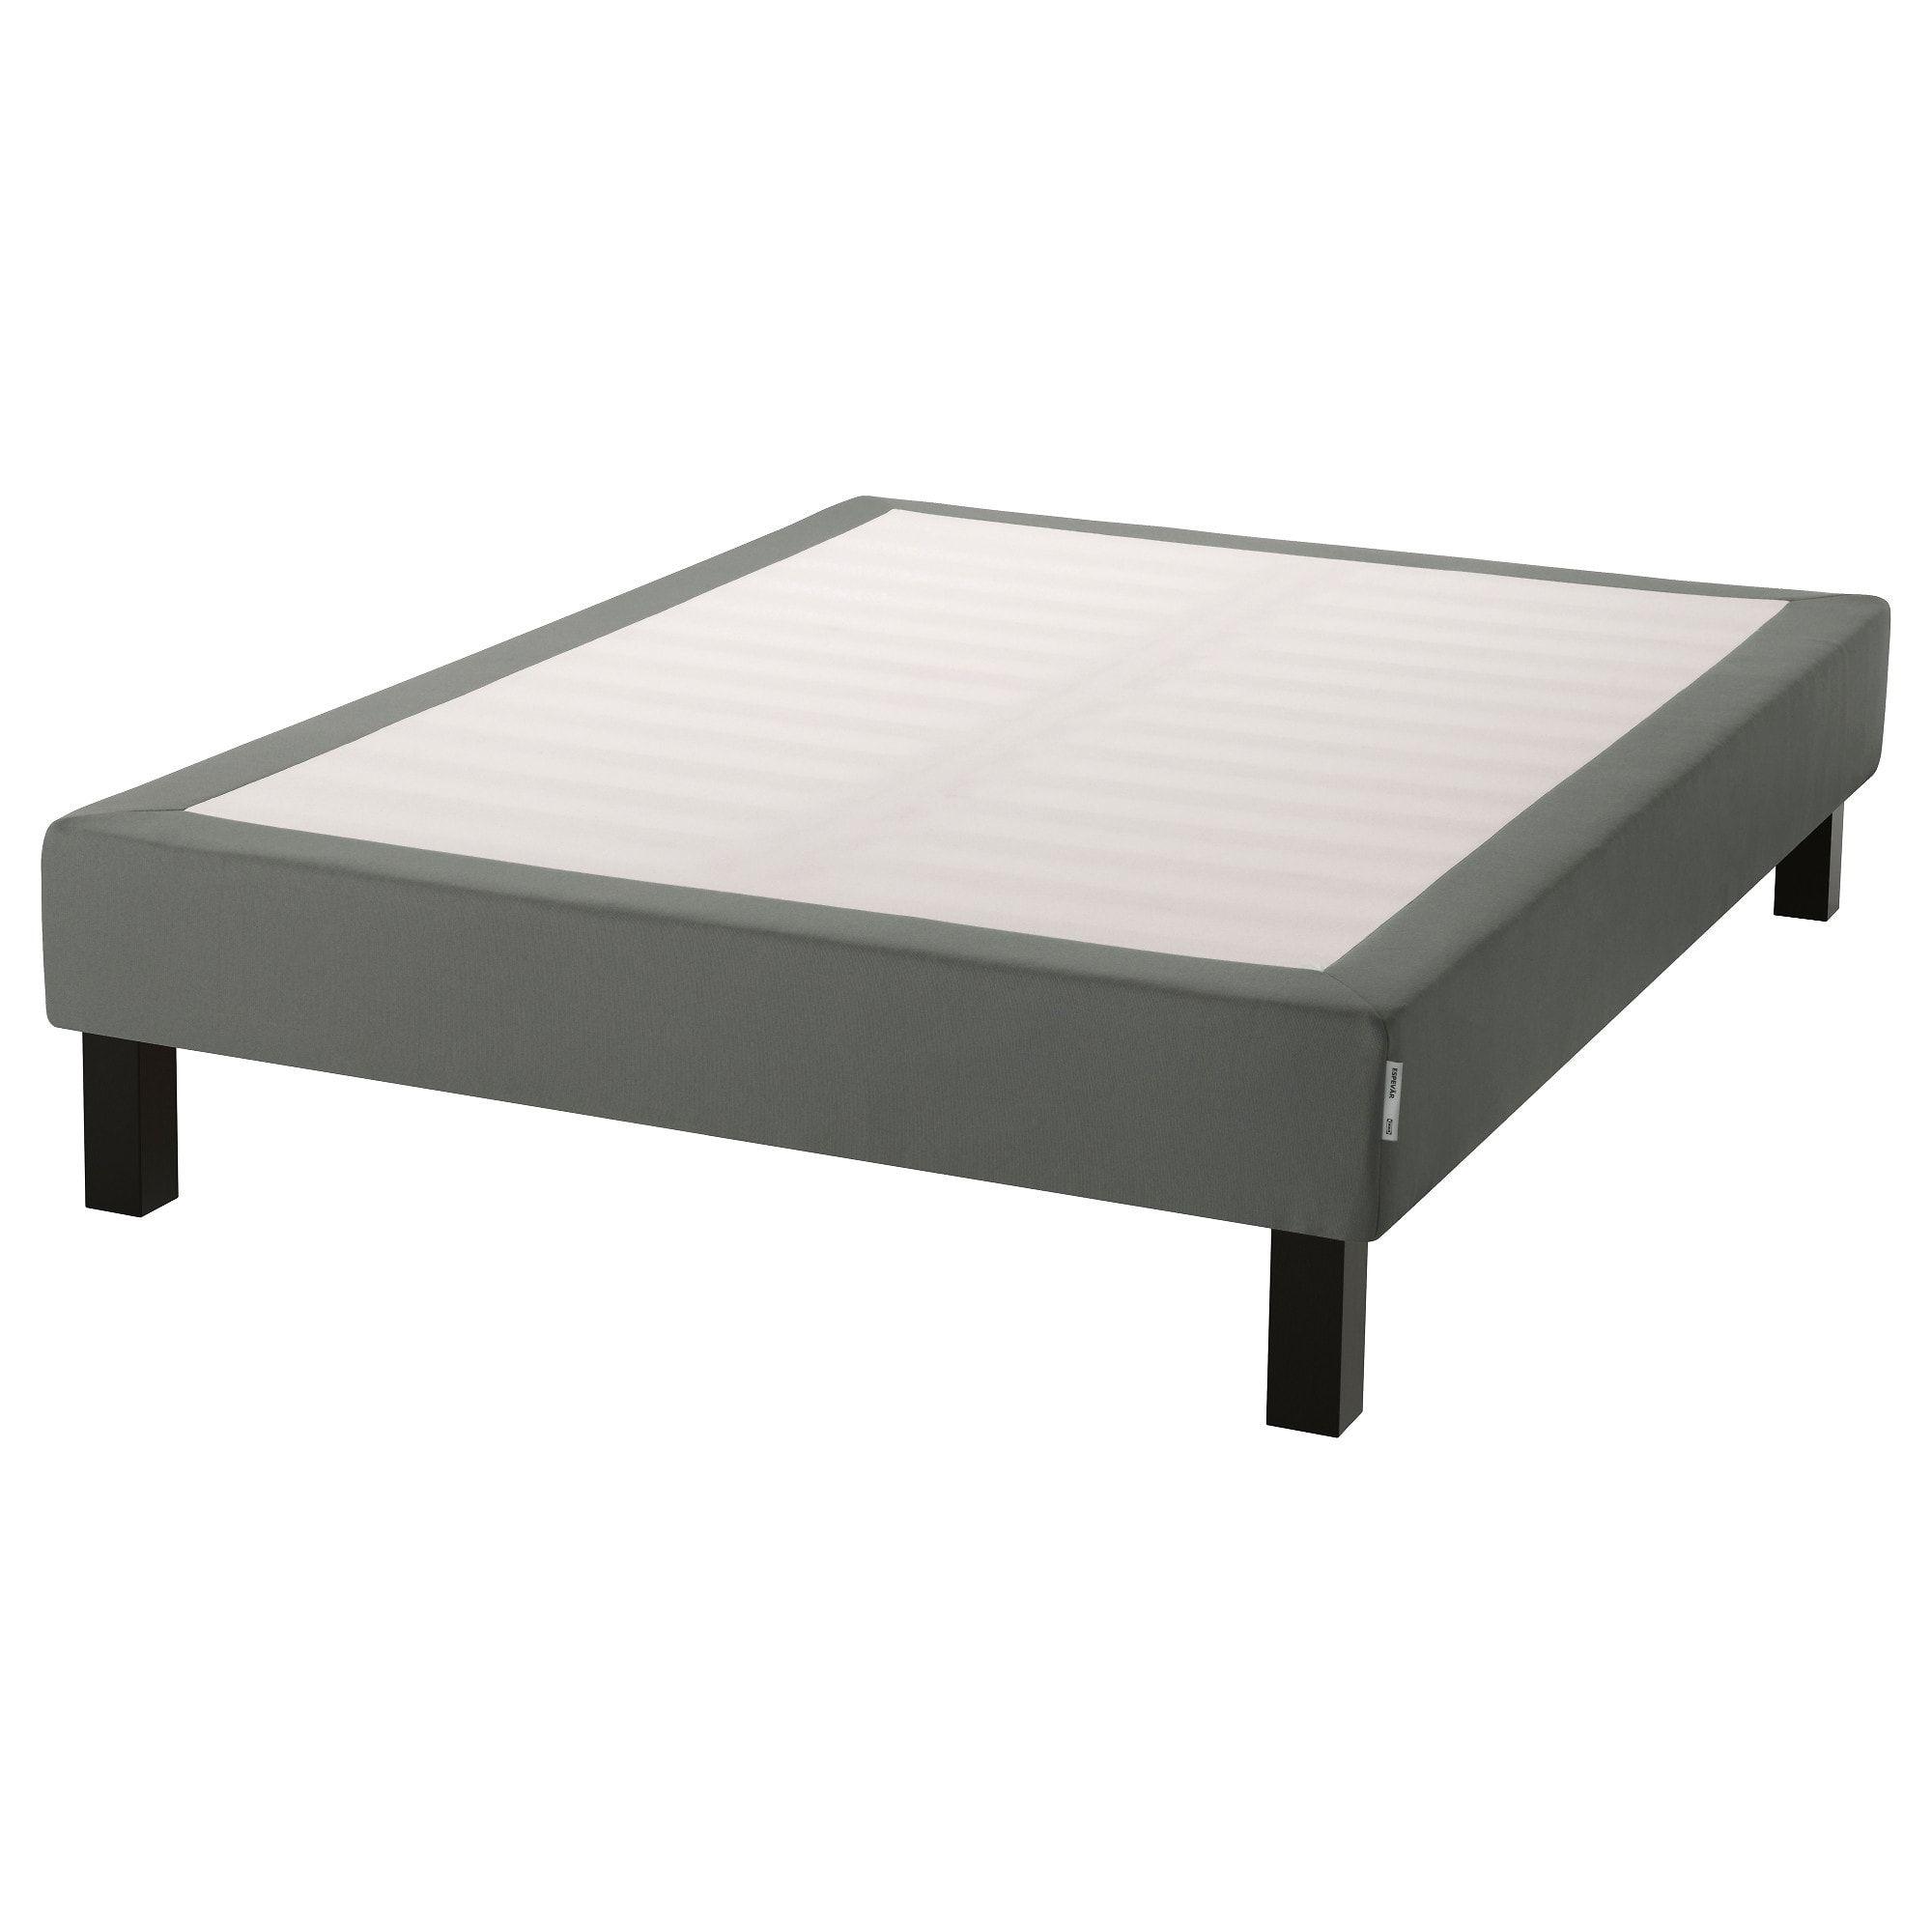 IKEA ESPEVAR Dark Gray Slatted mattress base with legs